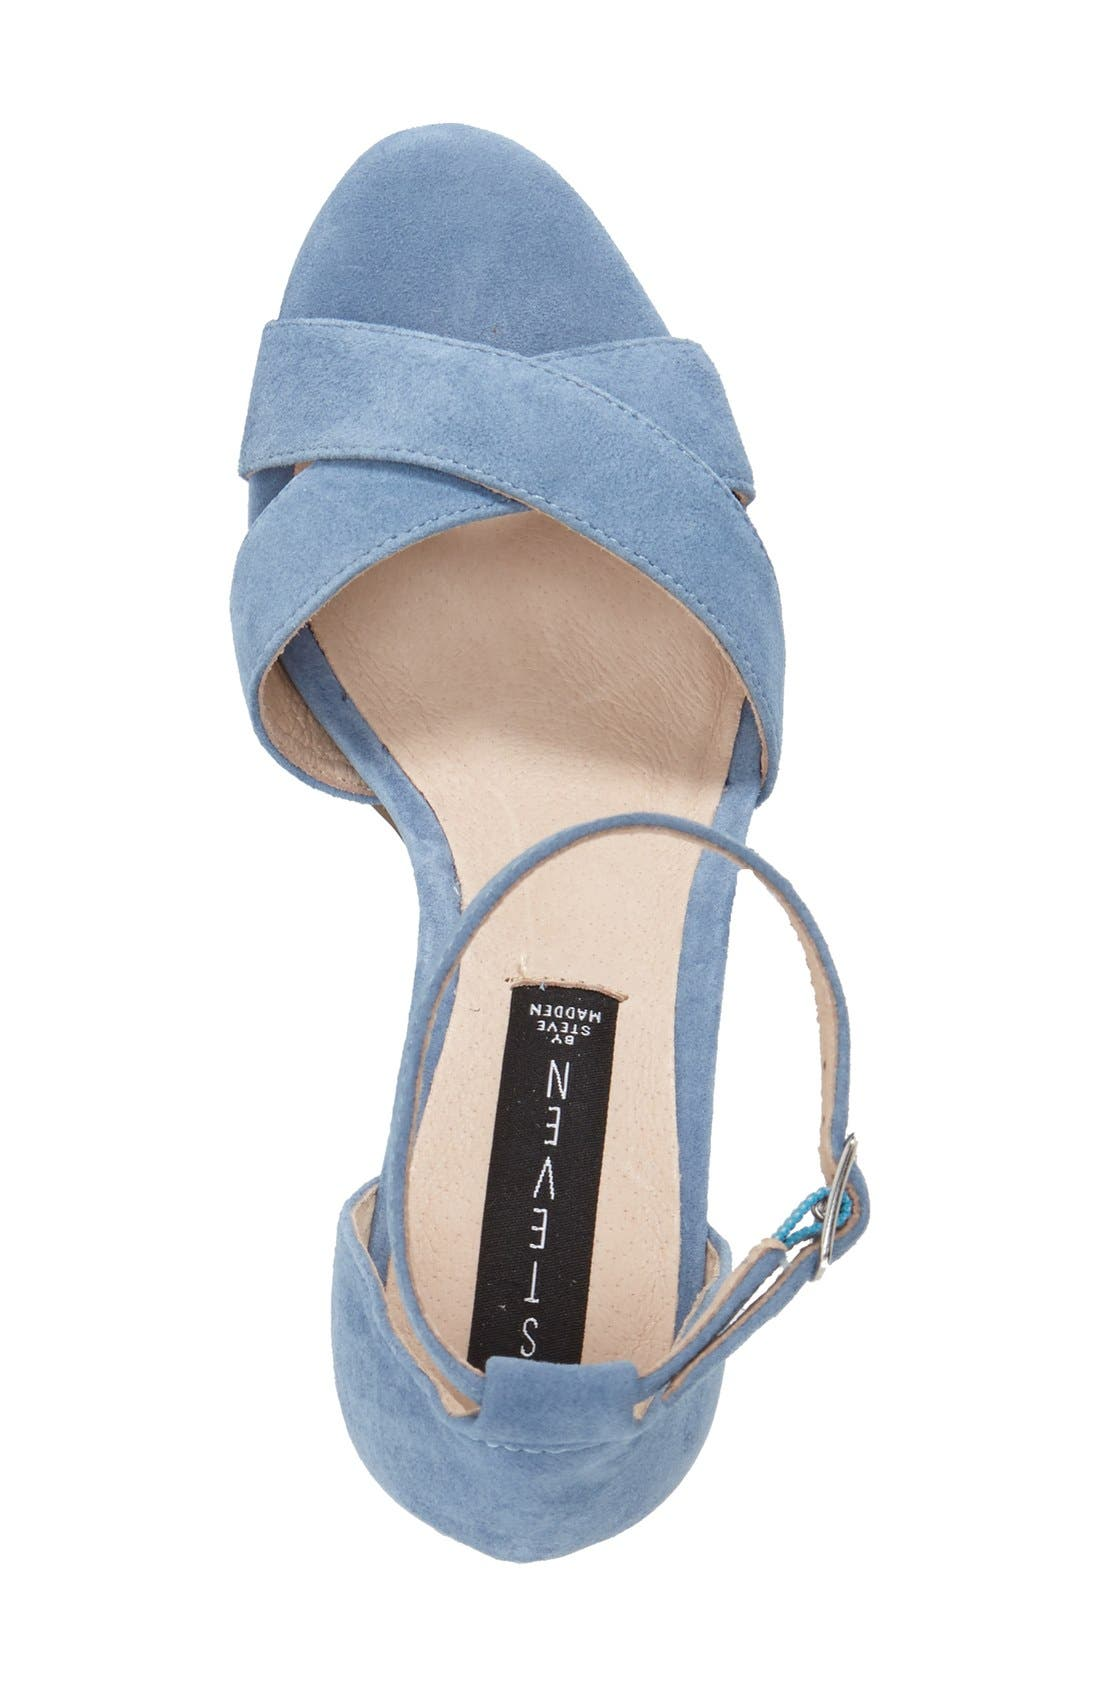 'Voomme' Ankle Strap Sandal,                             Alternate thumbnail 19, color,